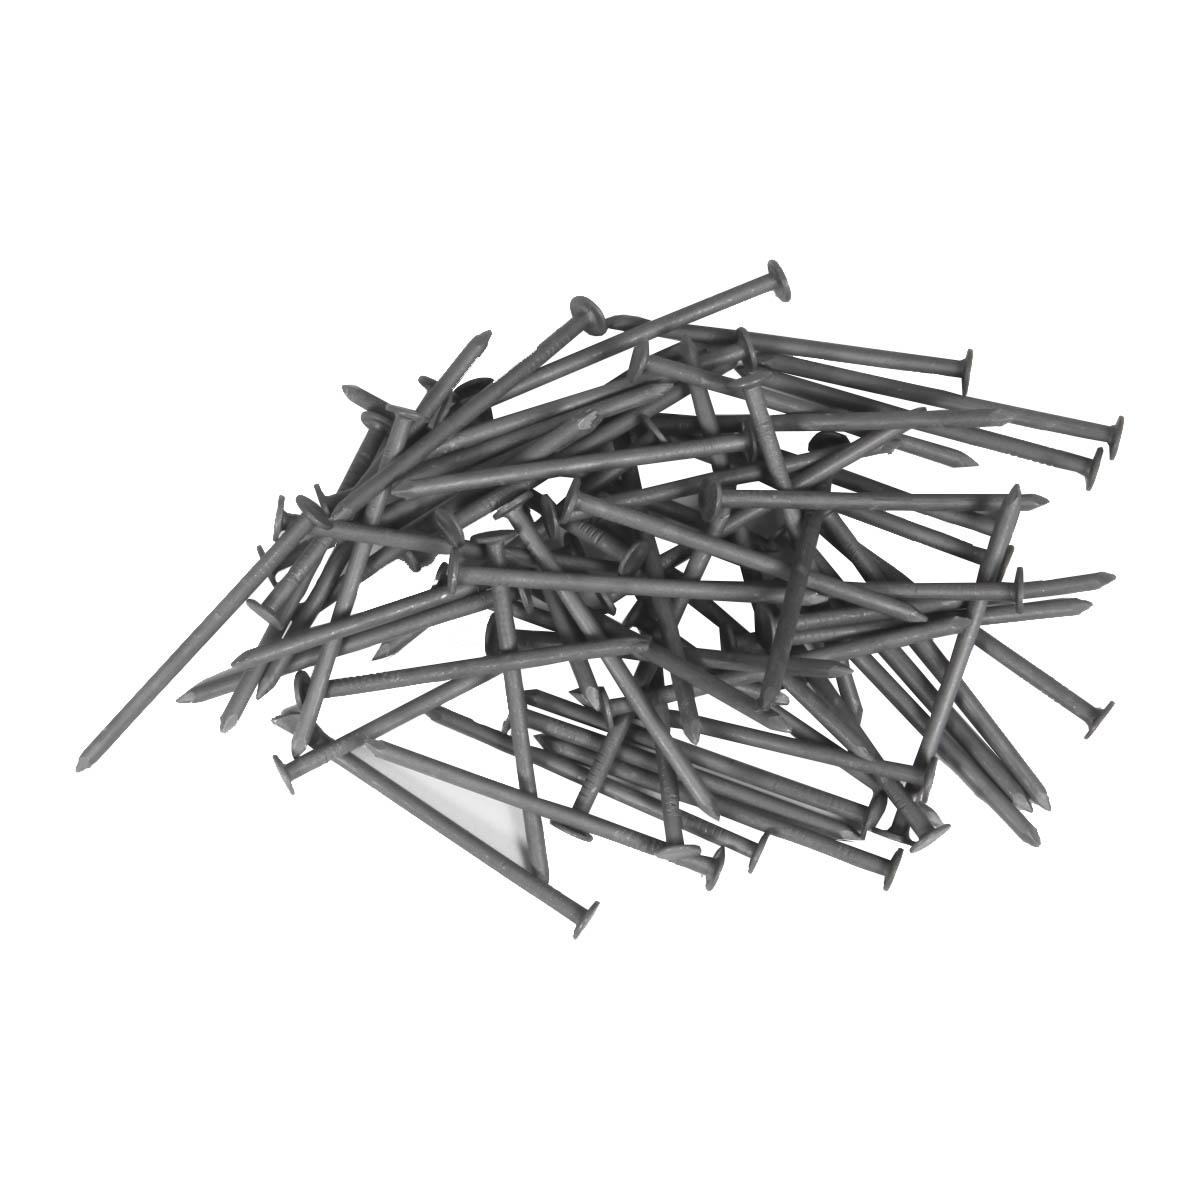 Phosphate Coated Nails - 1-1/2-in